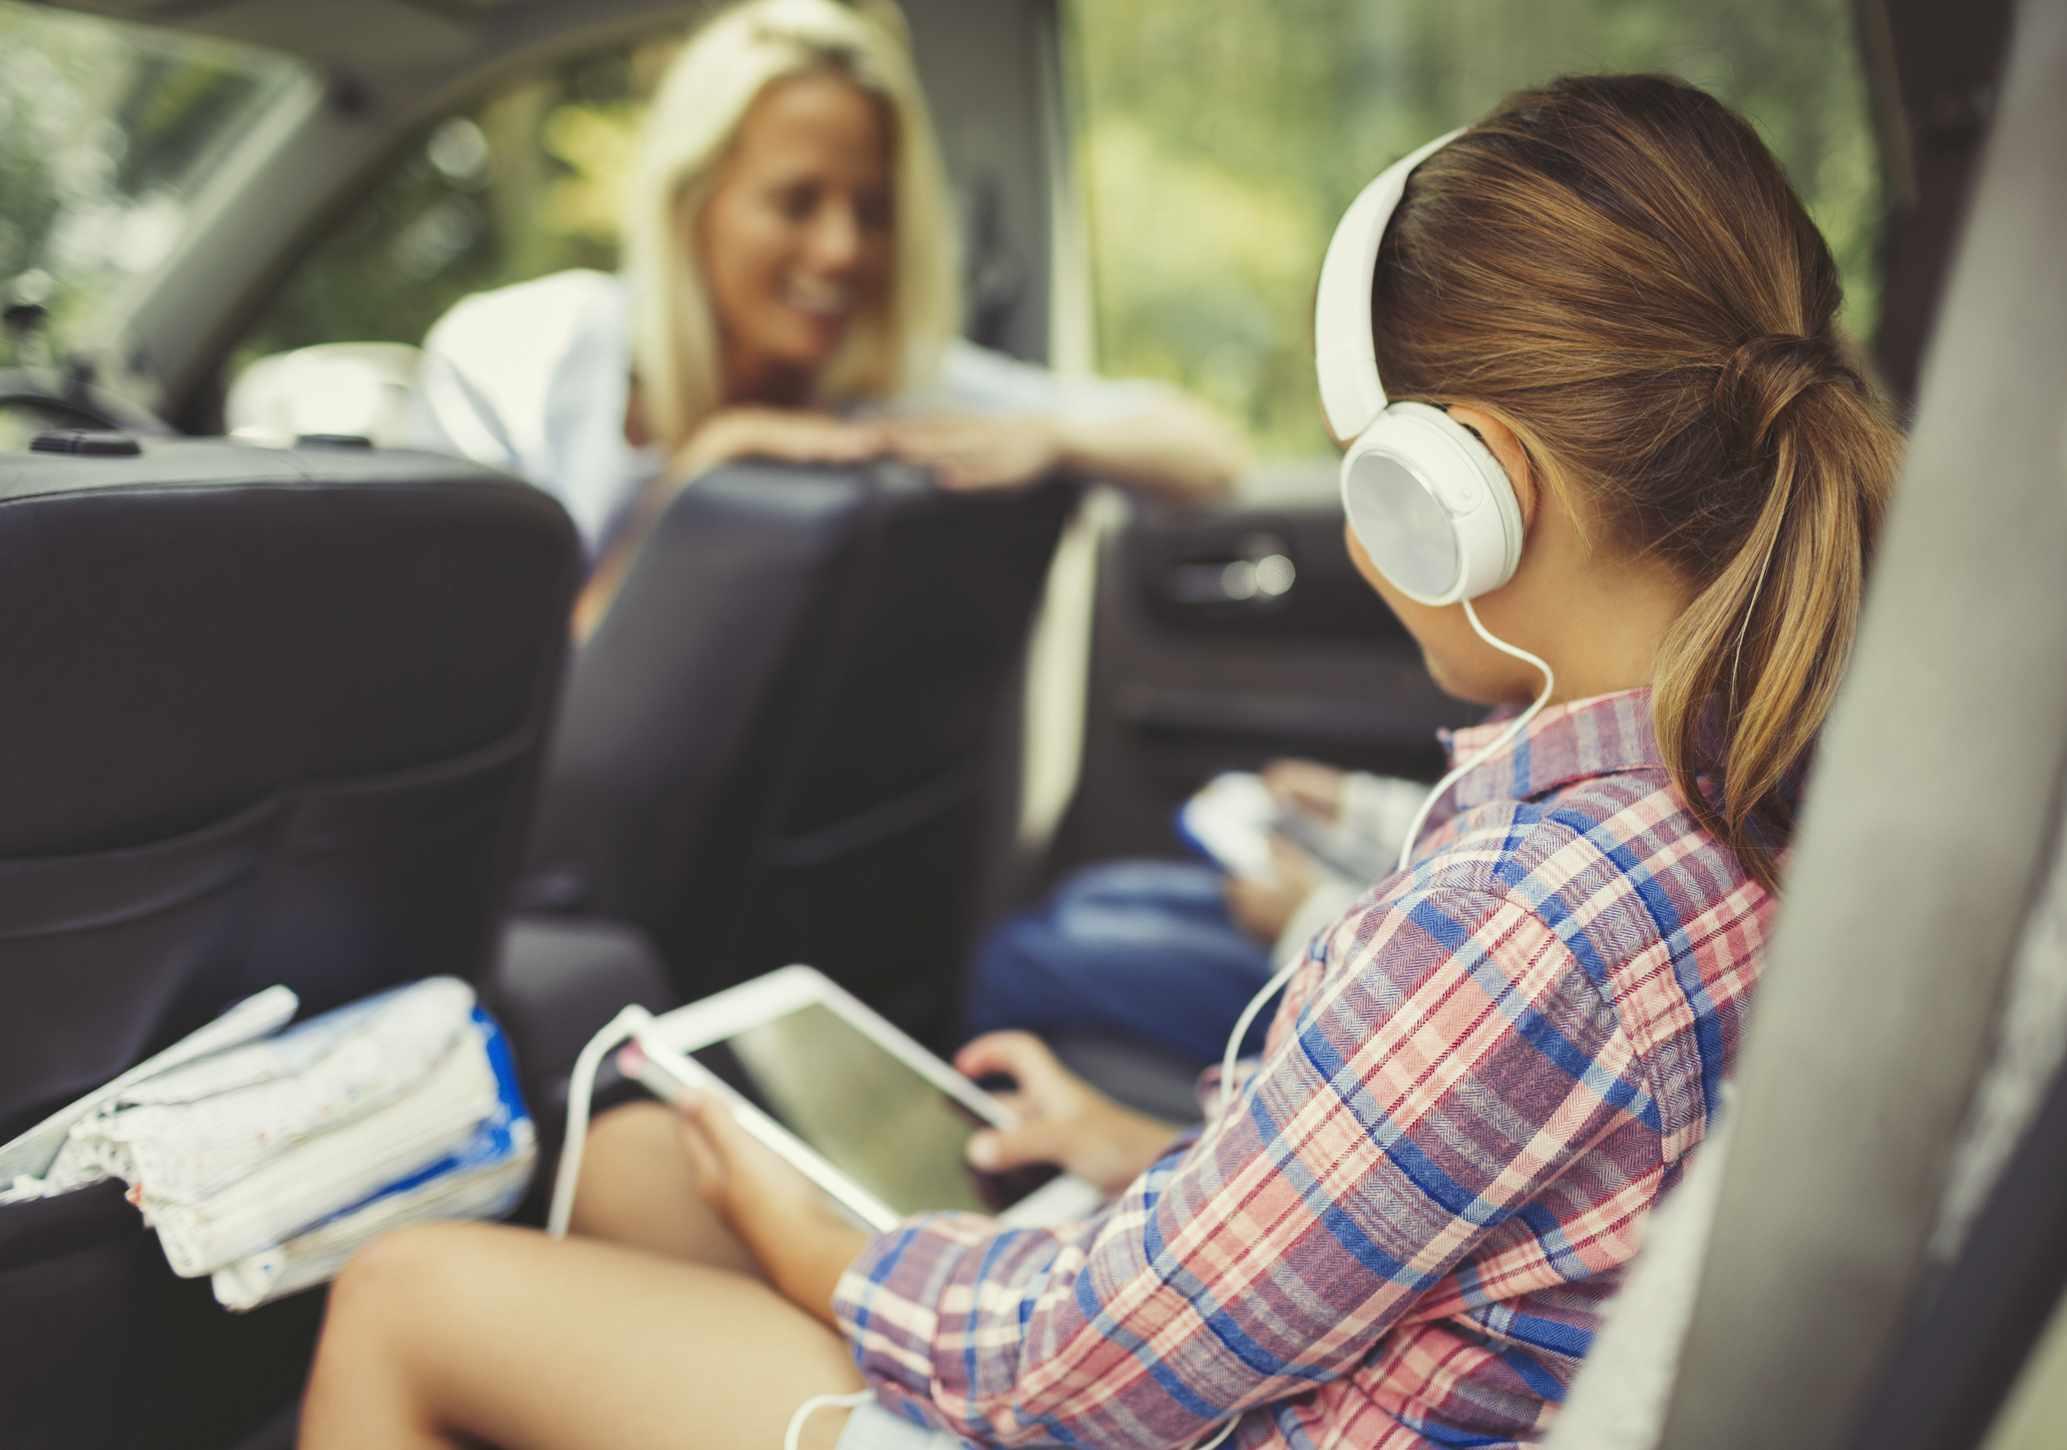 MIddle schooler listening to headphones in a car.